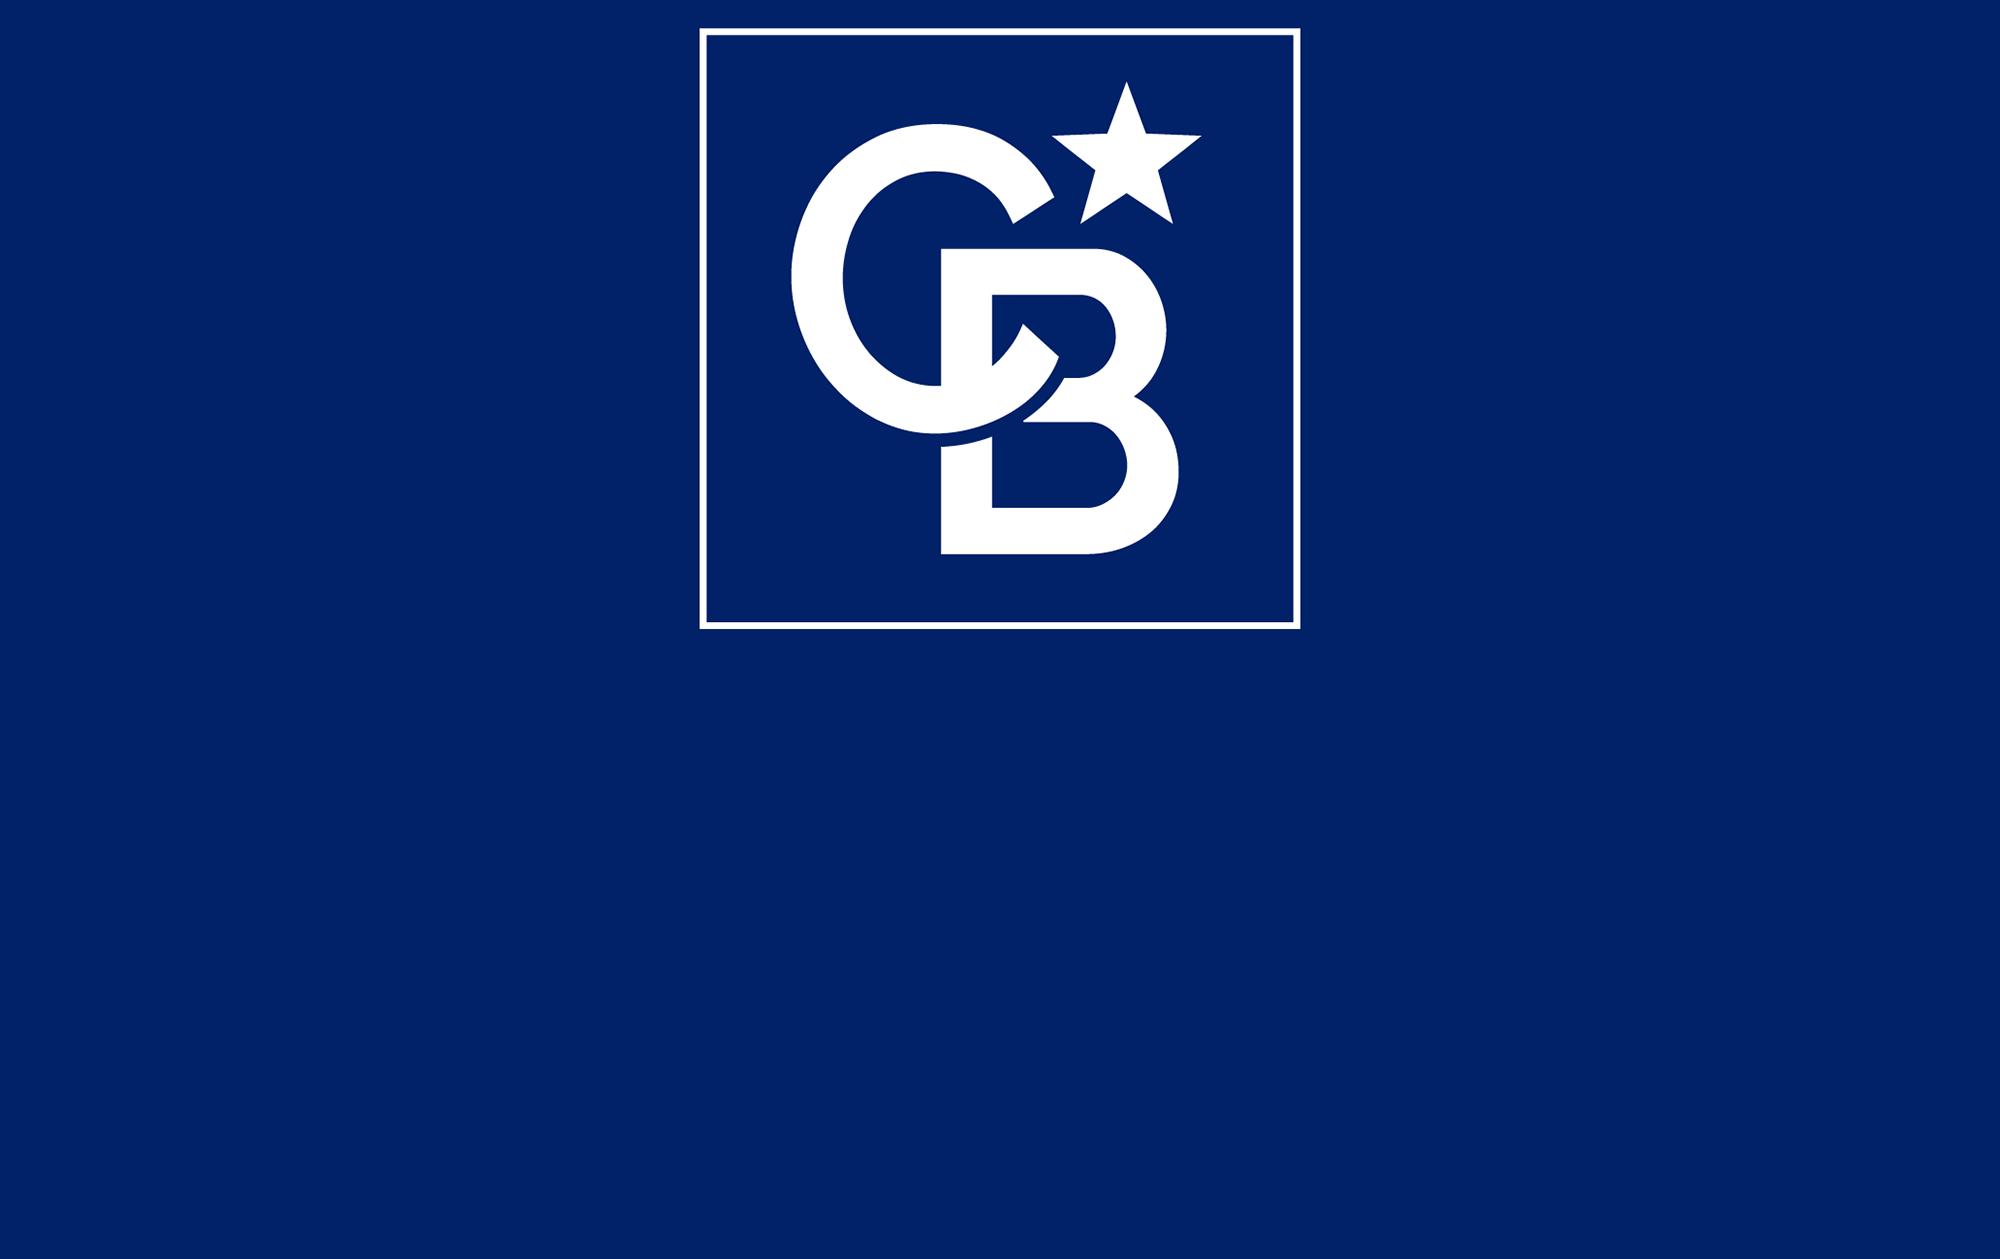 CBHB02 Logo